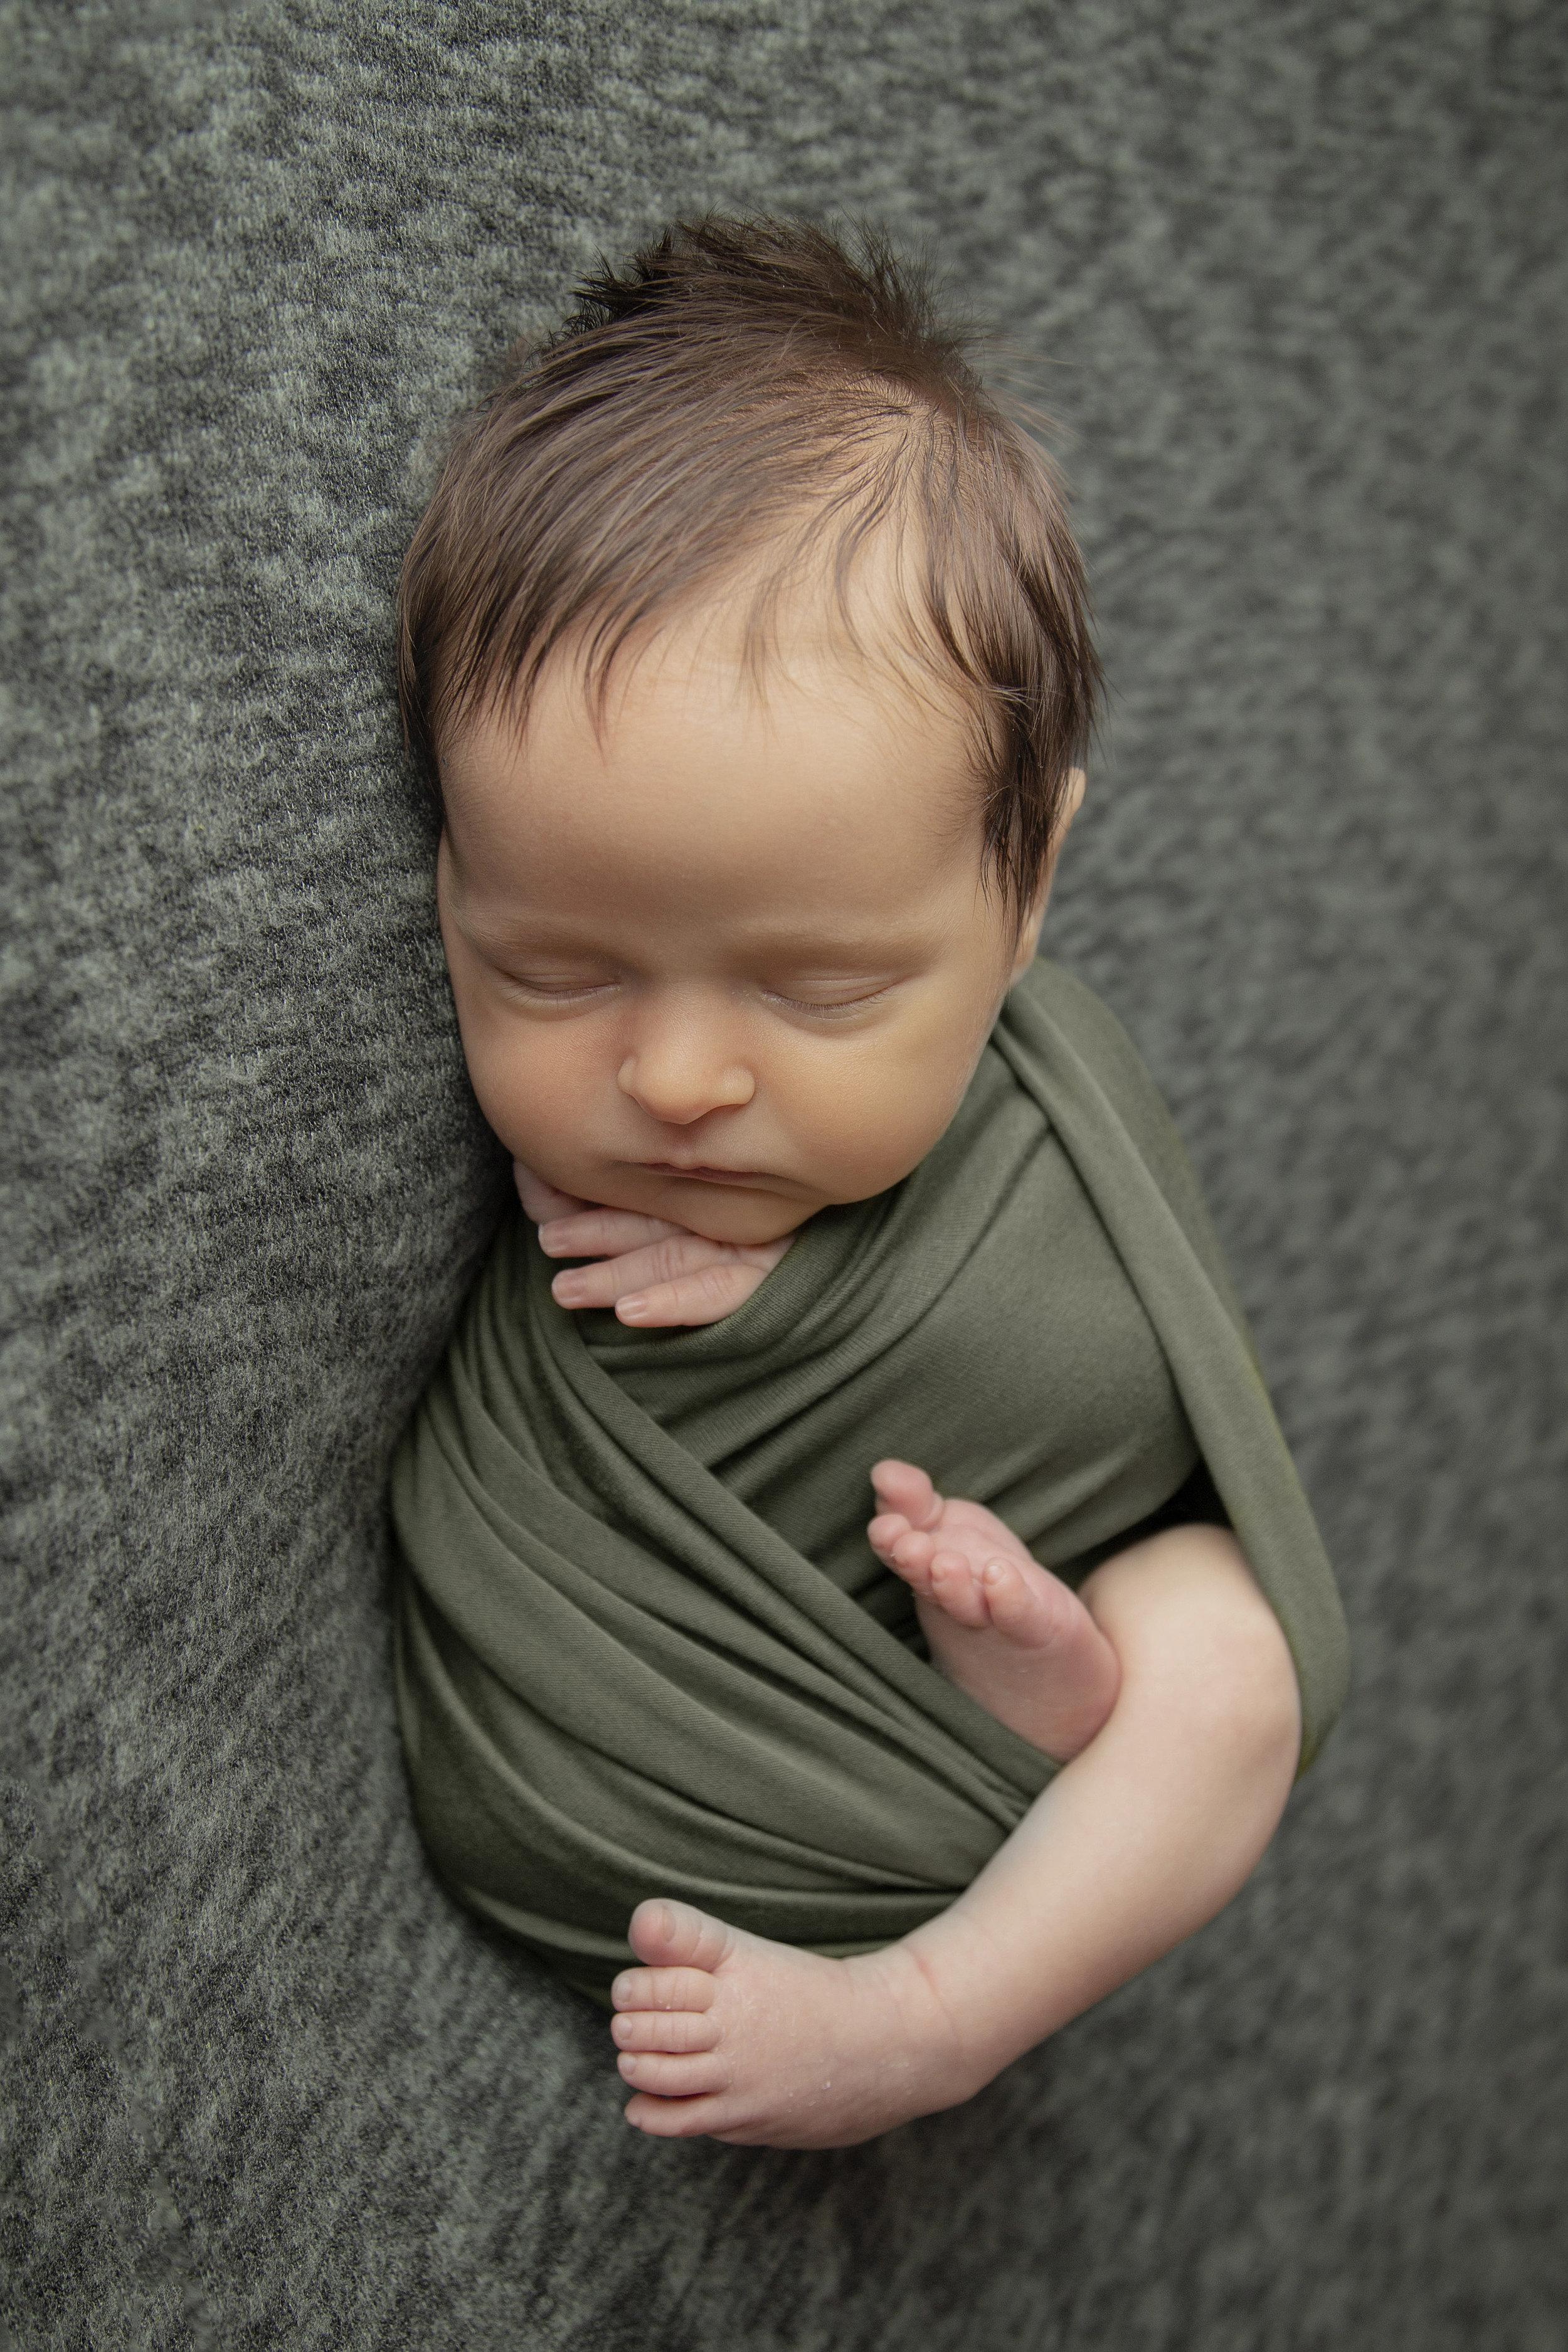 lancaster-newborn-photography-angie-englerth-aep031.jpg